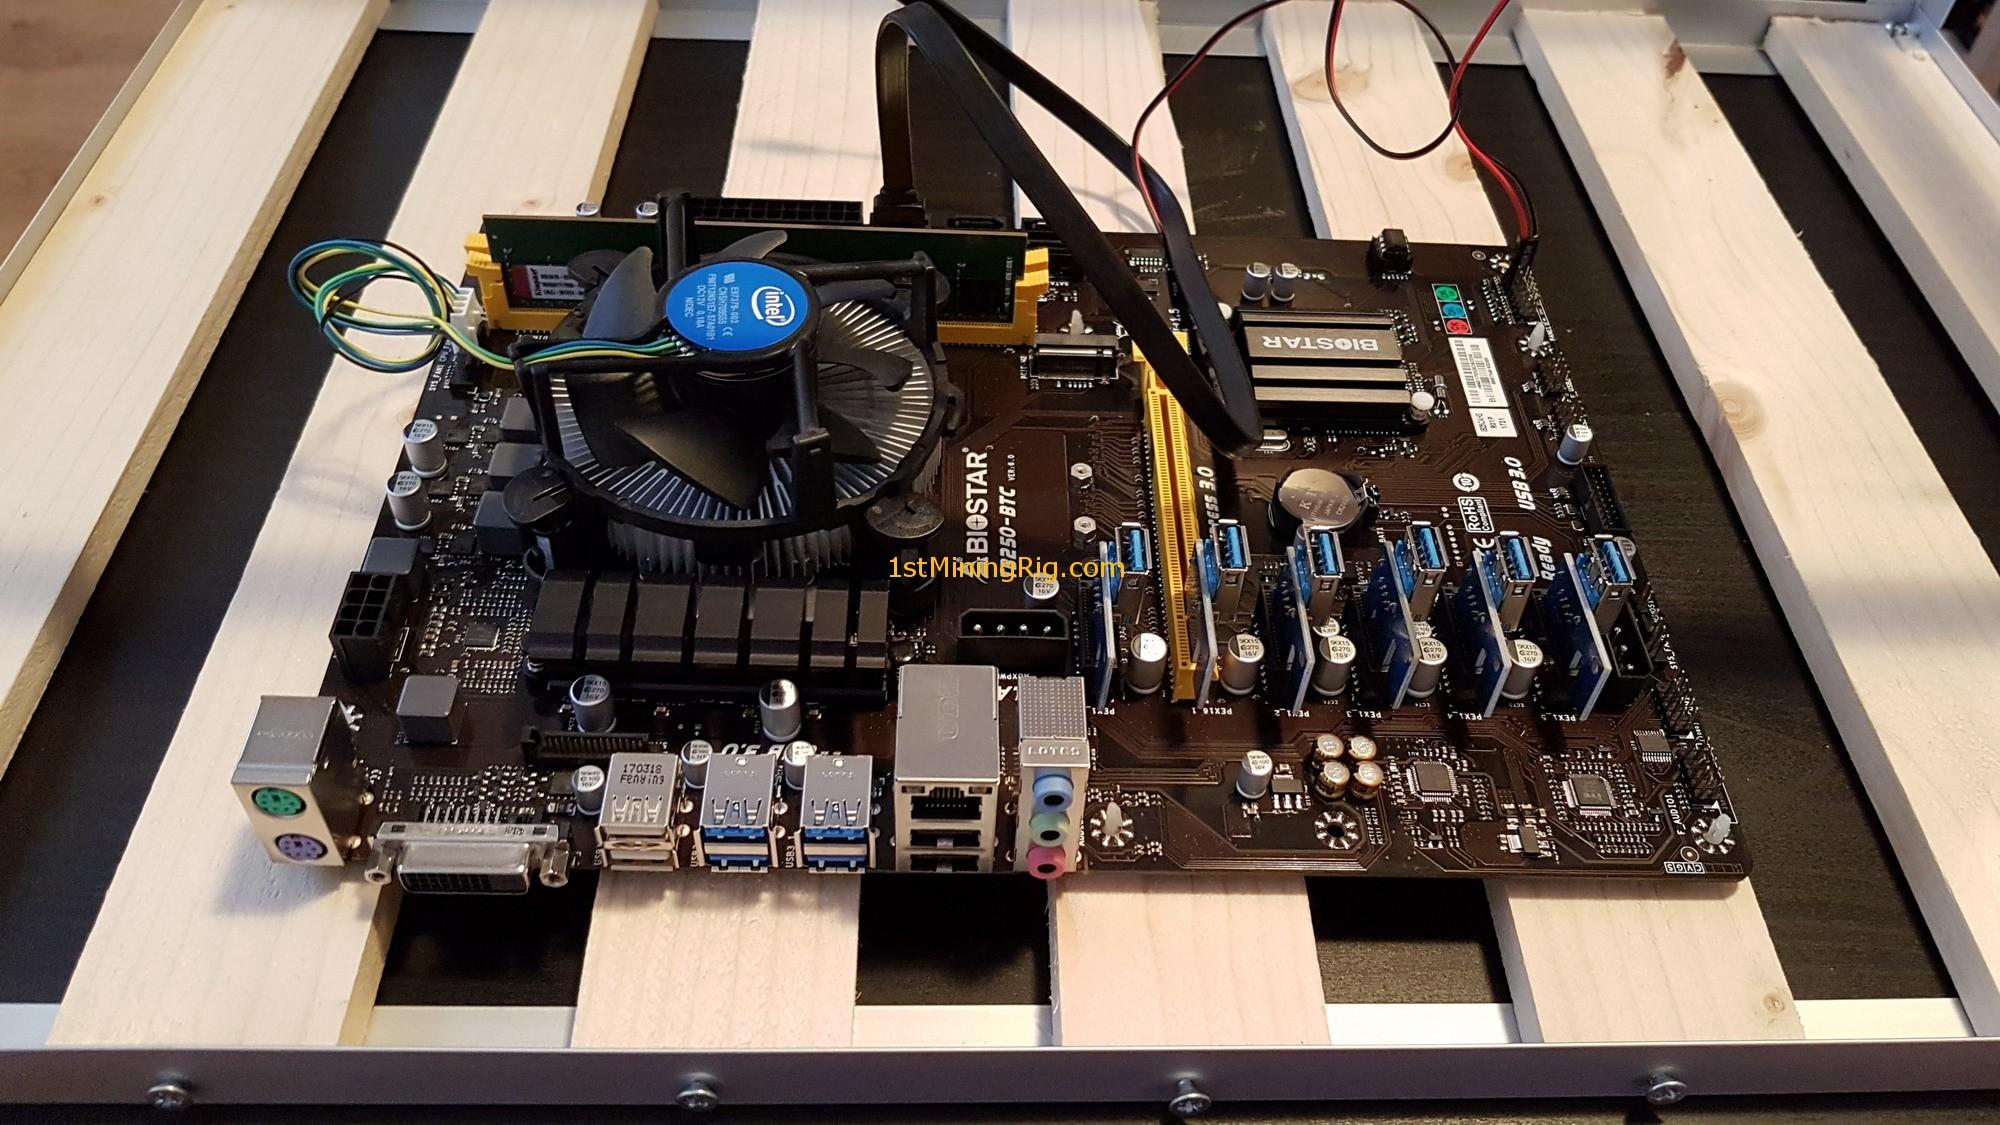 Nvidia Geforce Gtx 1070 Mining Performance Review 1st Rig Vga Evga Ftw Gaming Acx 30 8gb Gddr5 Gigabyte 1 Motherboard Cpu Ram Ssd